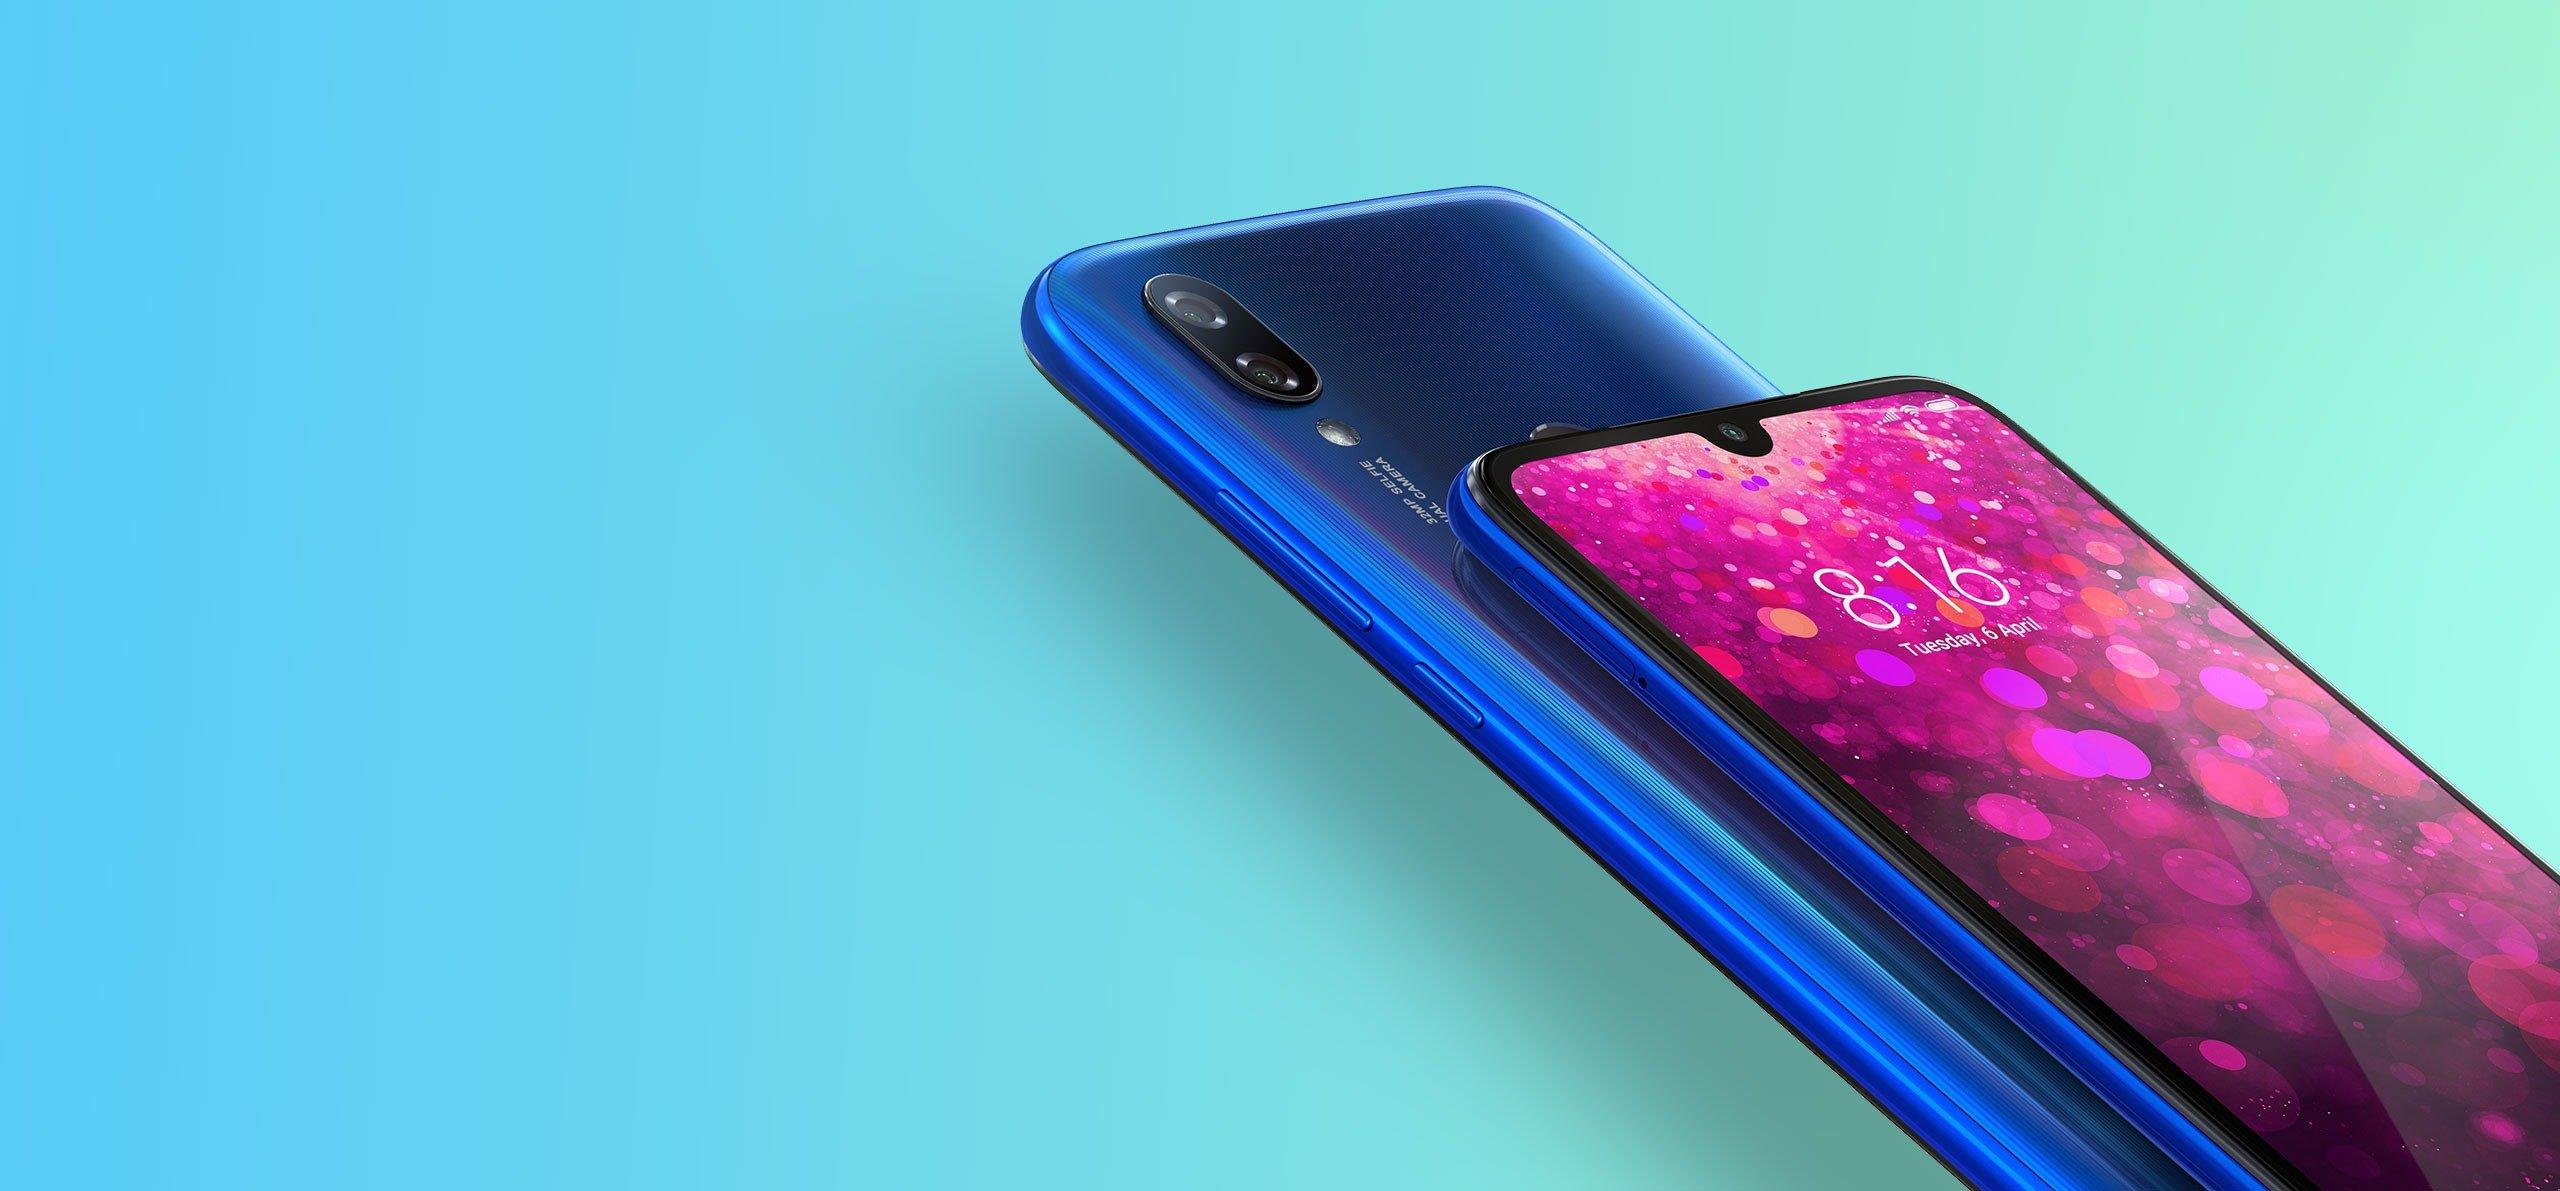 Xiaomi launches Redmi Y3 & Redmi 7 in India, price starts at Rs 7,999